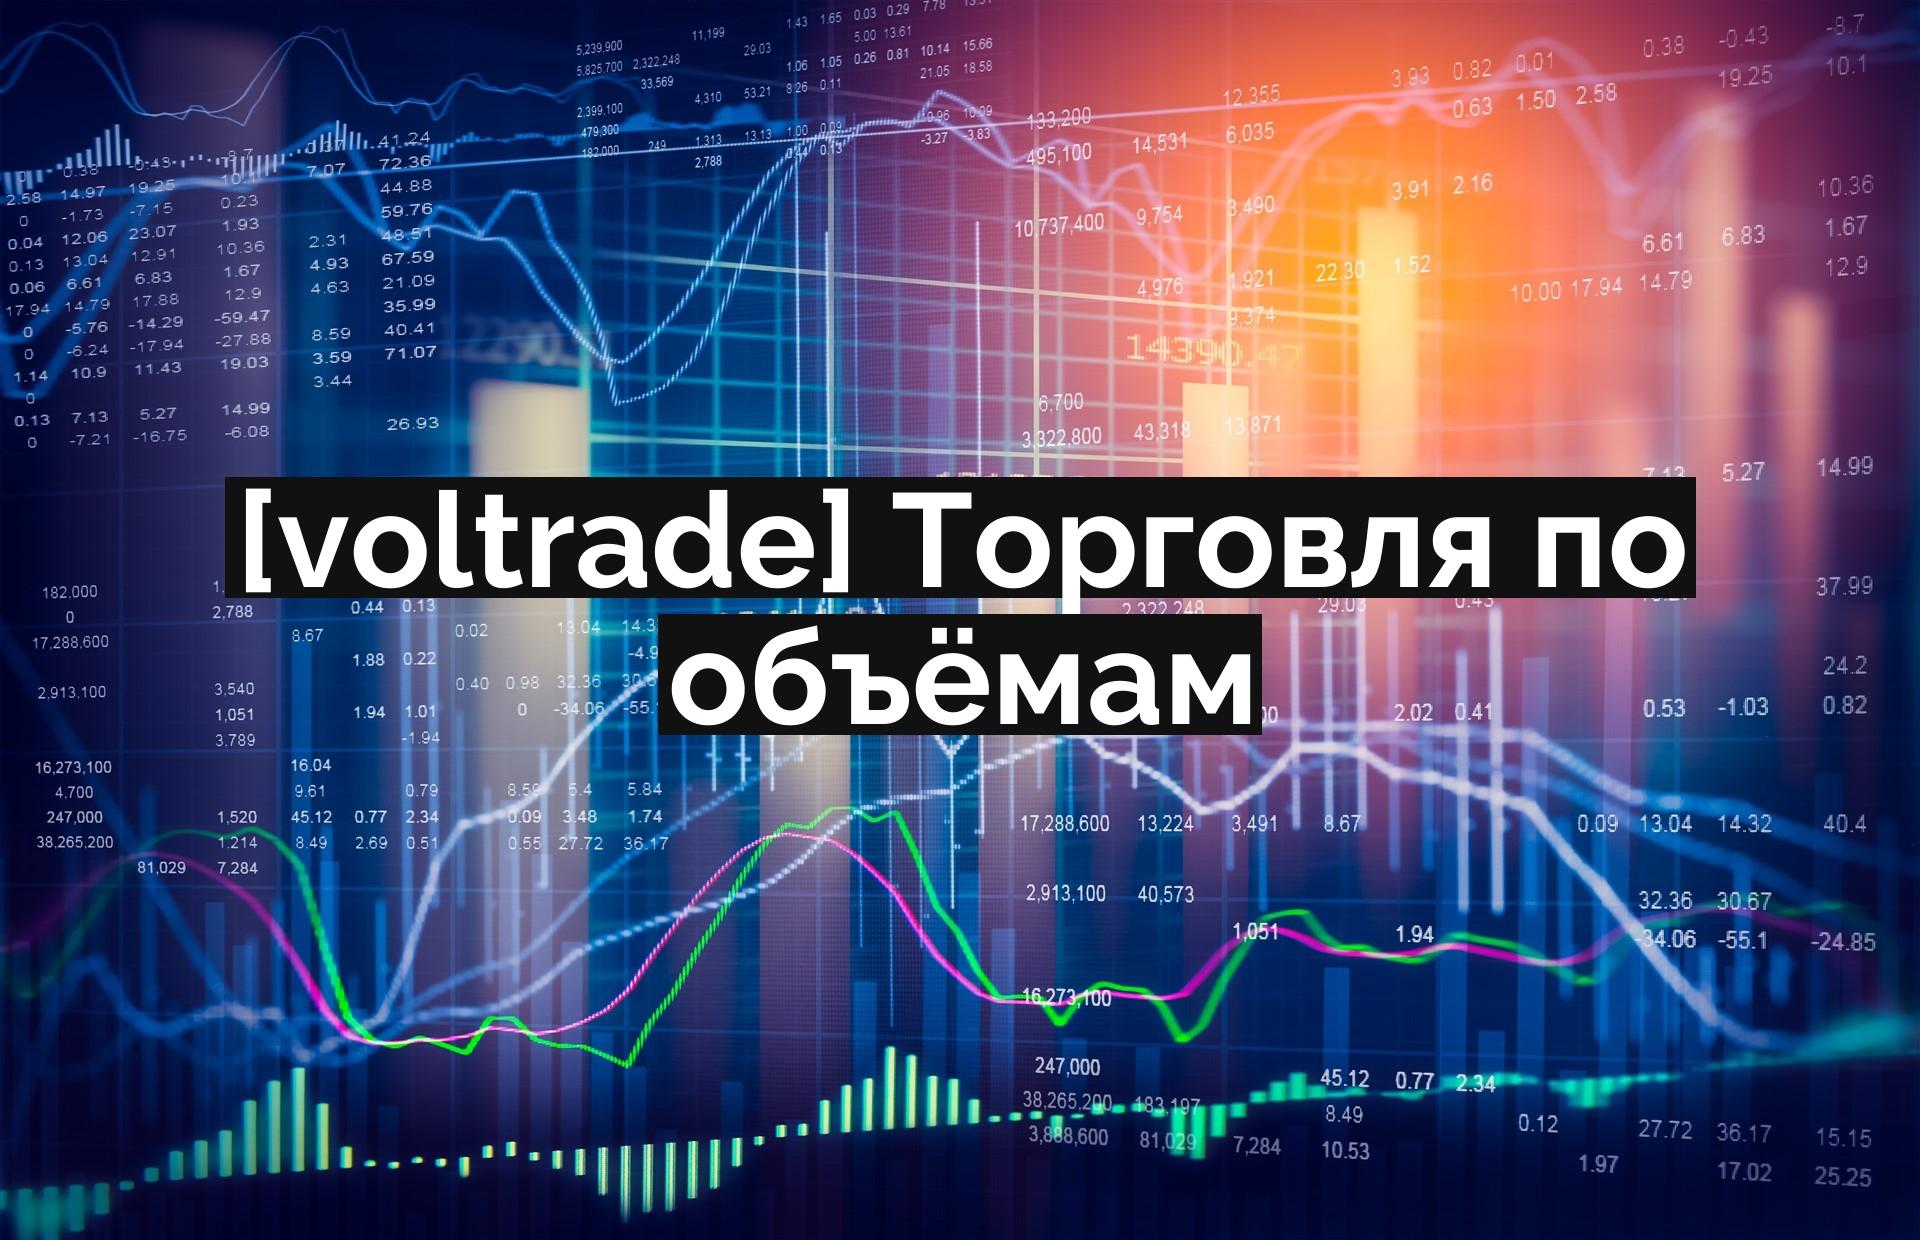 [voltrade] Торговля по объёмам